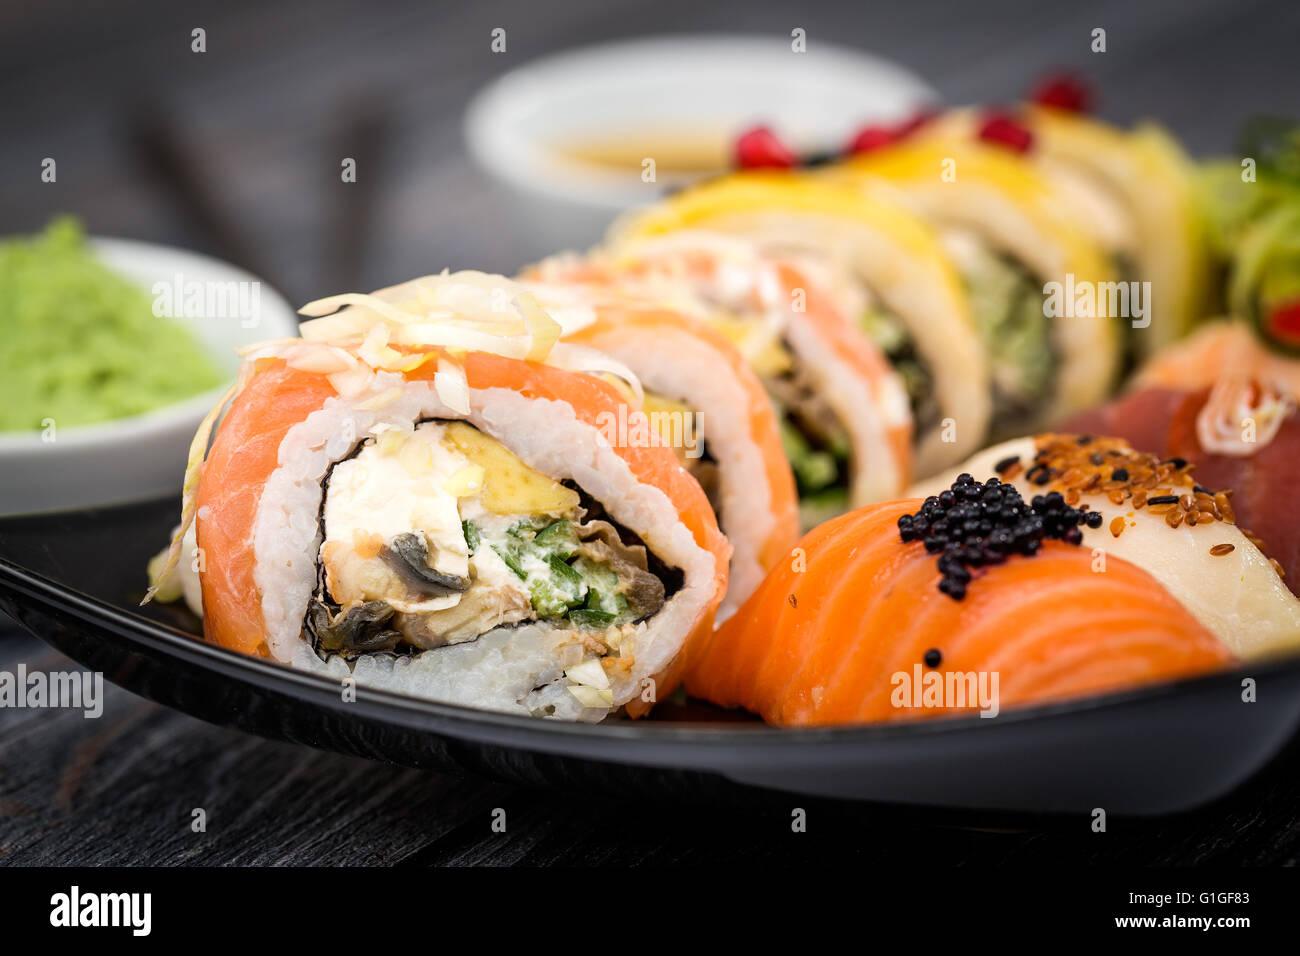 Sushi Roll materias makki alimentos frescos mariscos susi - stock image Imagen De Stock